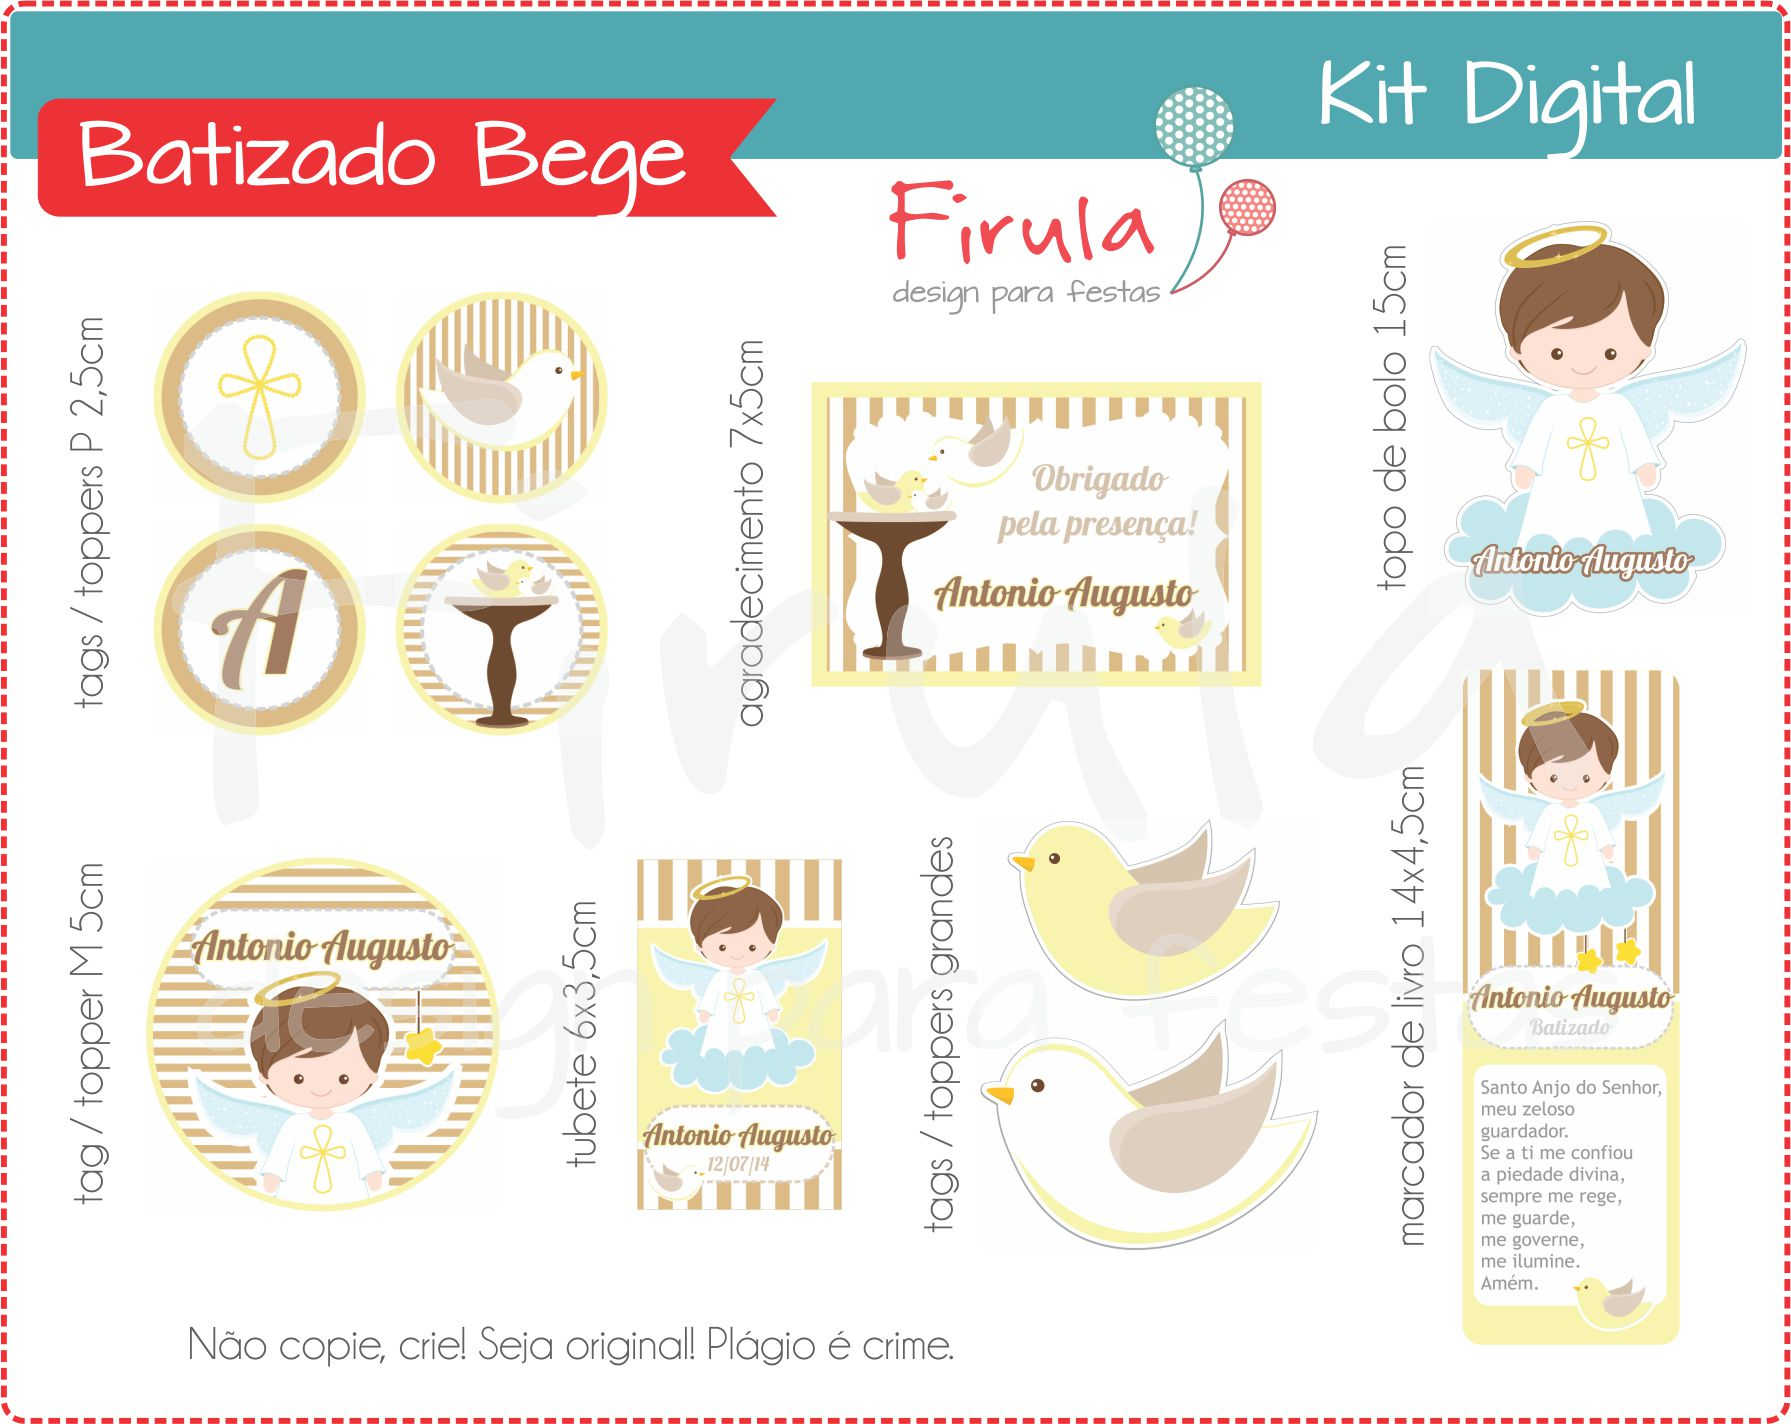 Kit Festa Digital Batizado Bege No Elo7 Firula Festas 9334c4